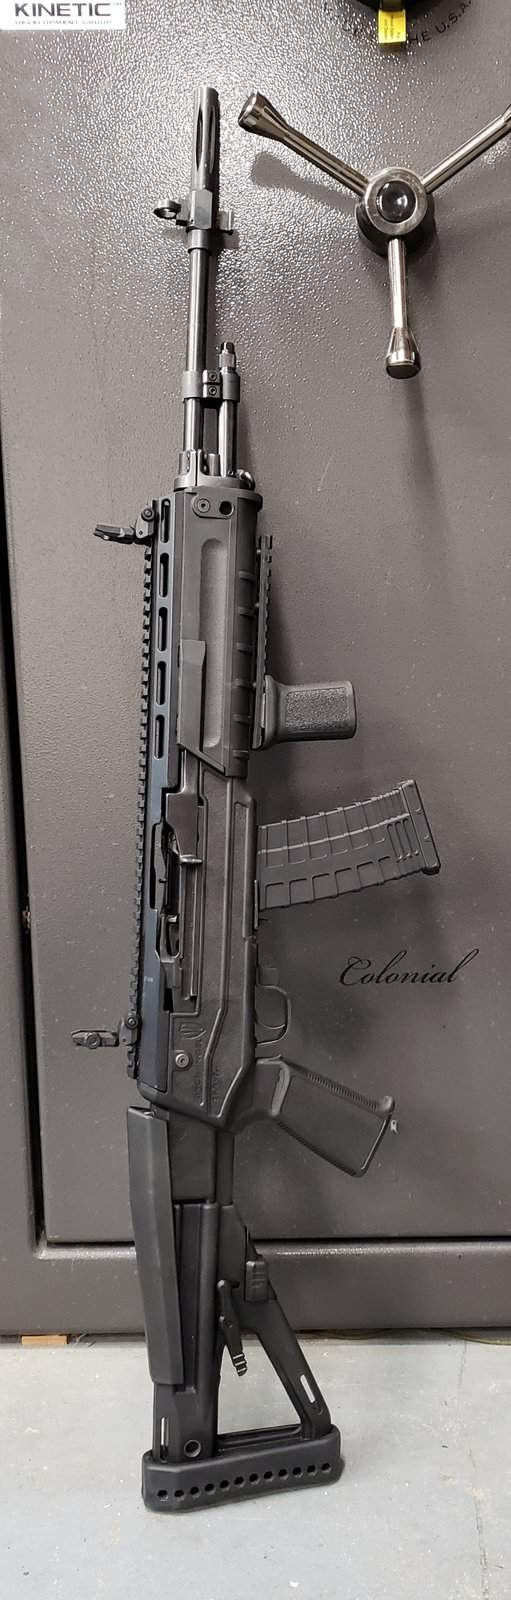 Ruger Mini 14 w/ Archangel Sparta stock | Northwest Firearms